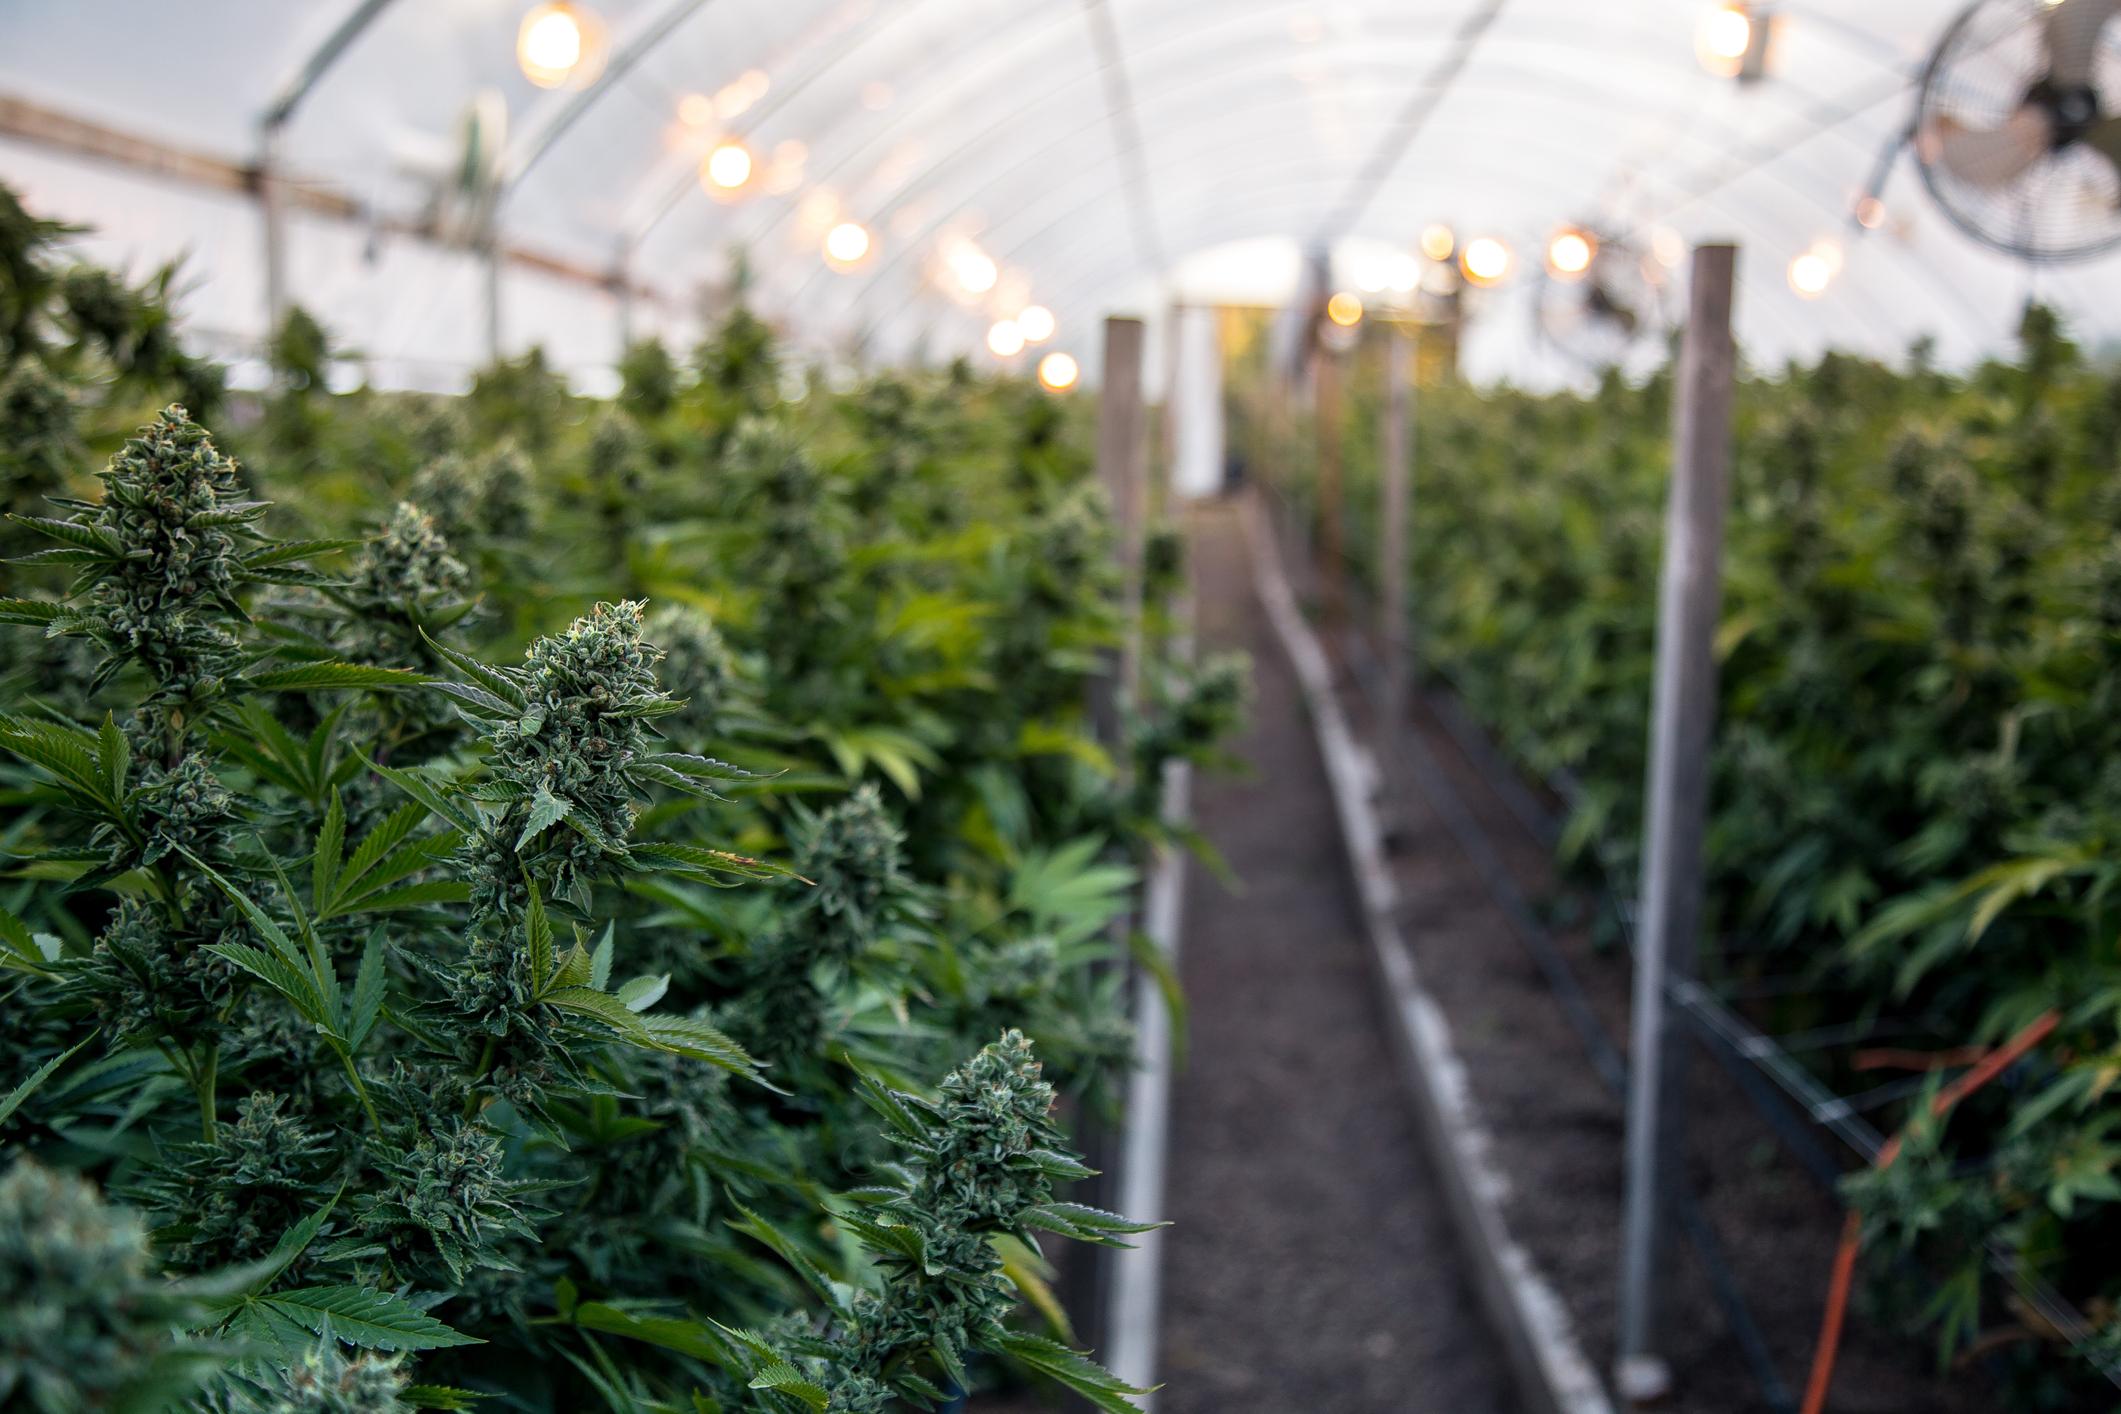 Rows of marijuana plants inside of a greenhouse